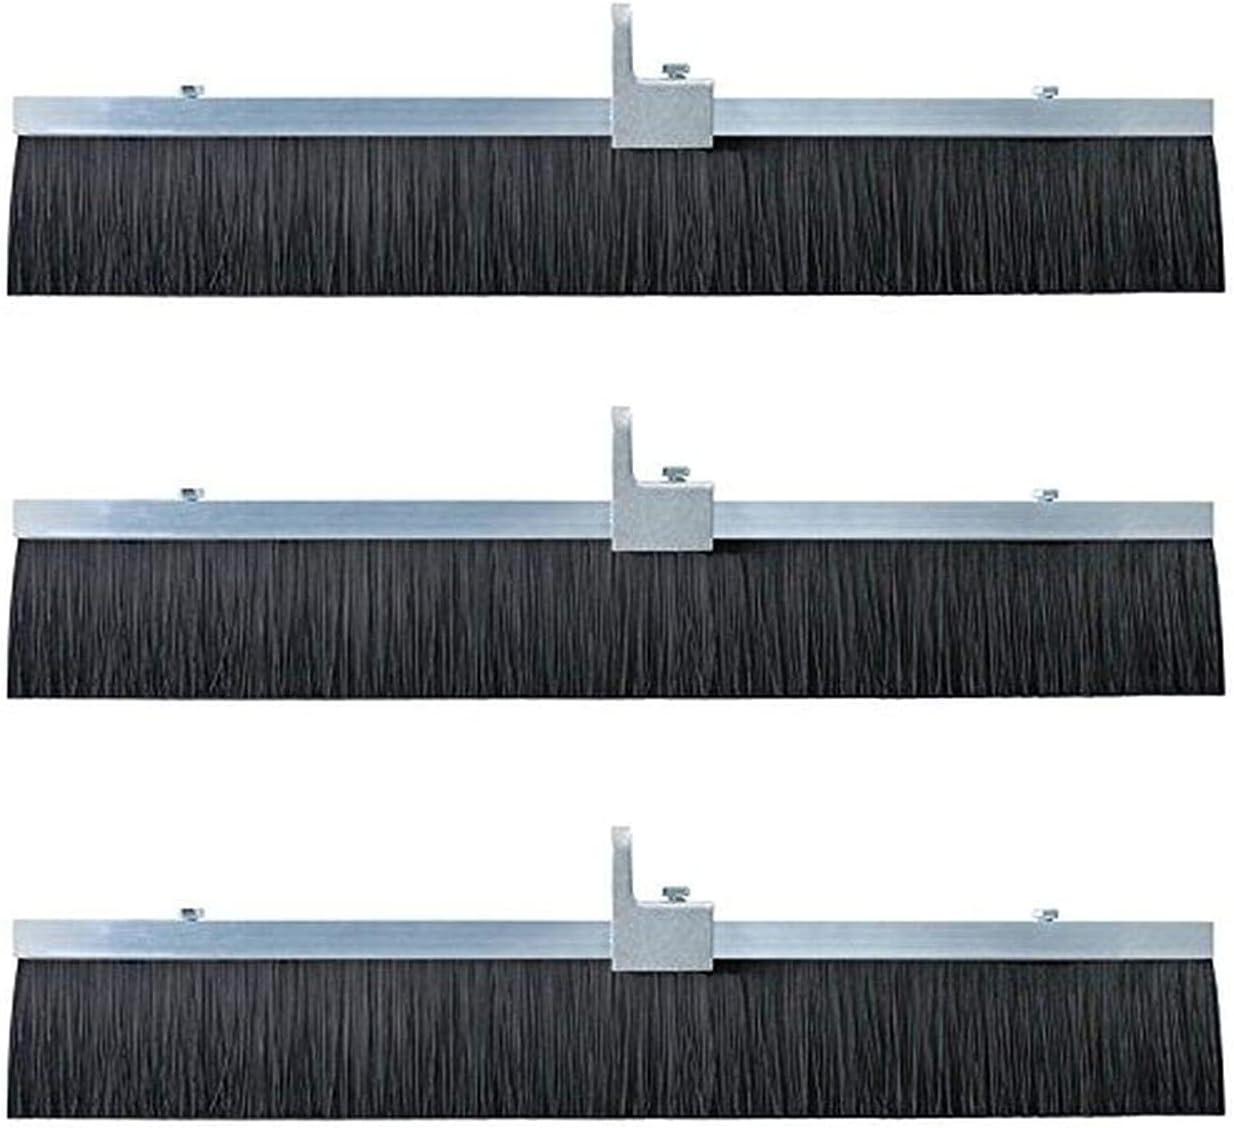 Kraft Finally popular brand Tool CC156 36-Inch Weigh-Lite Broom safety Concrete Three Pack